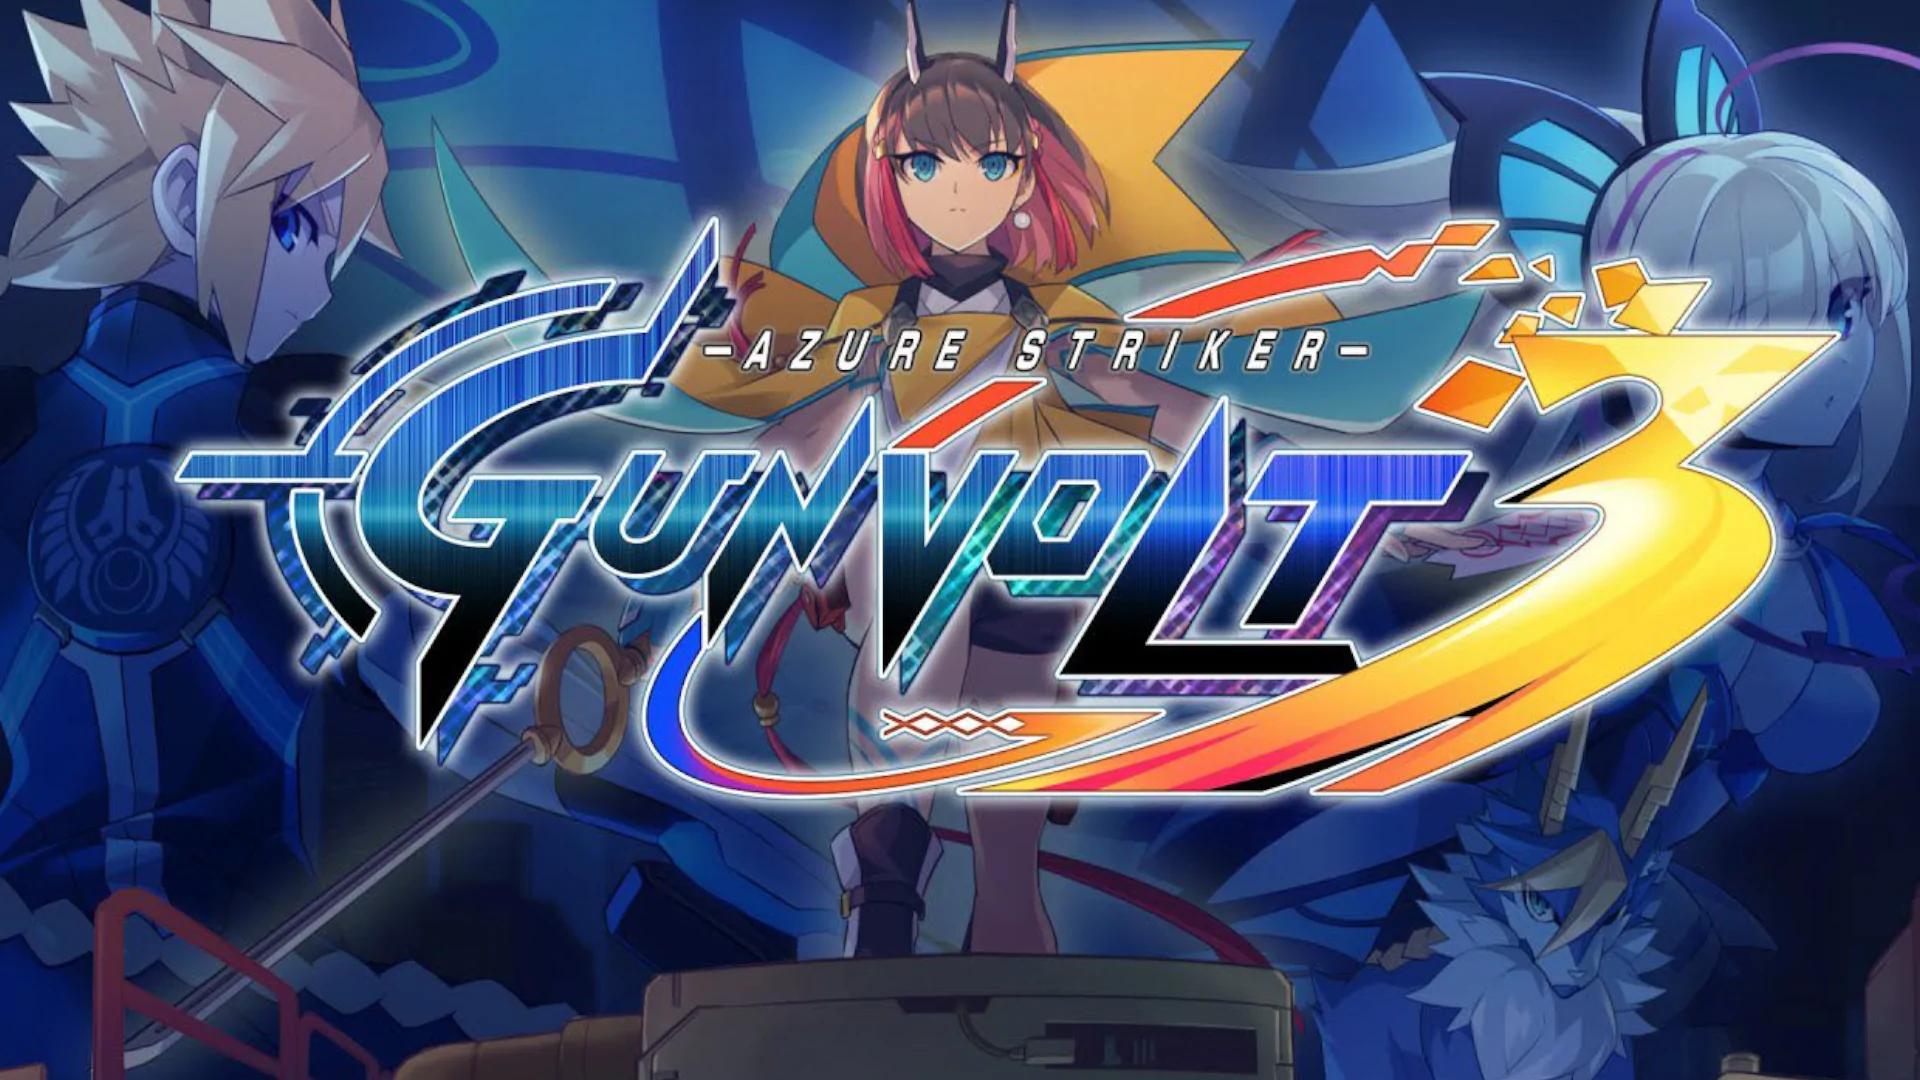 Azure Striker Gunvolt 3 annunciato per Switch